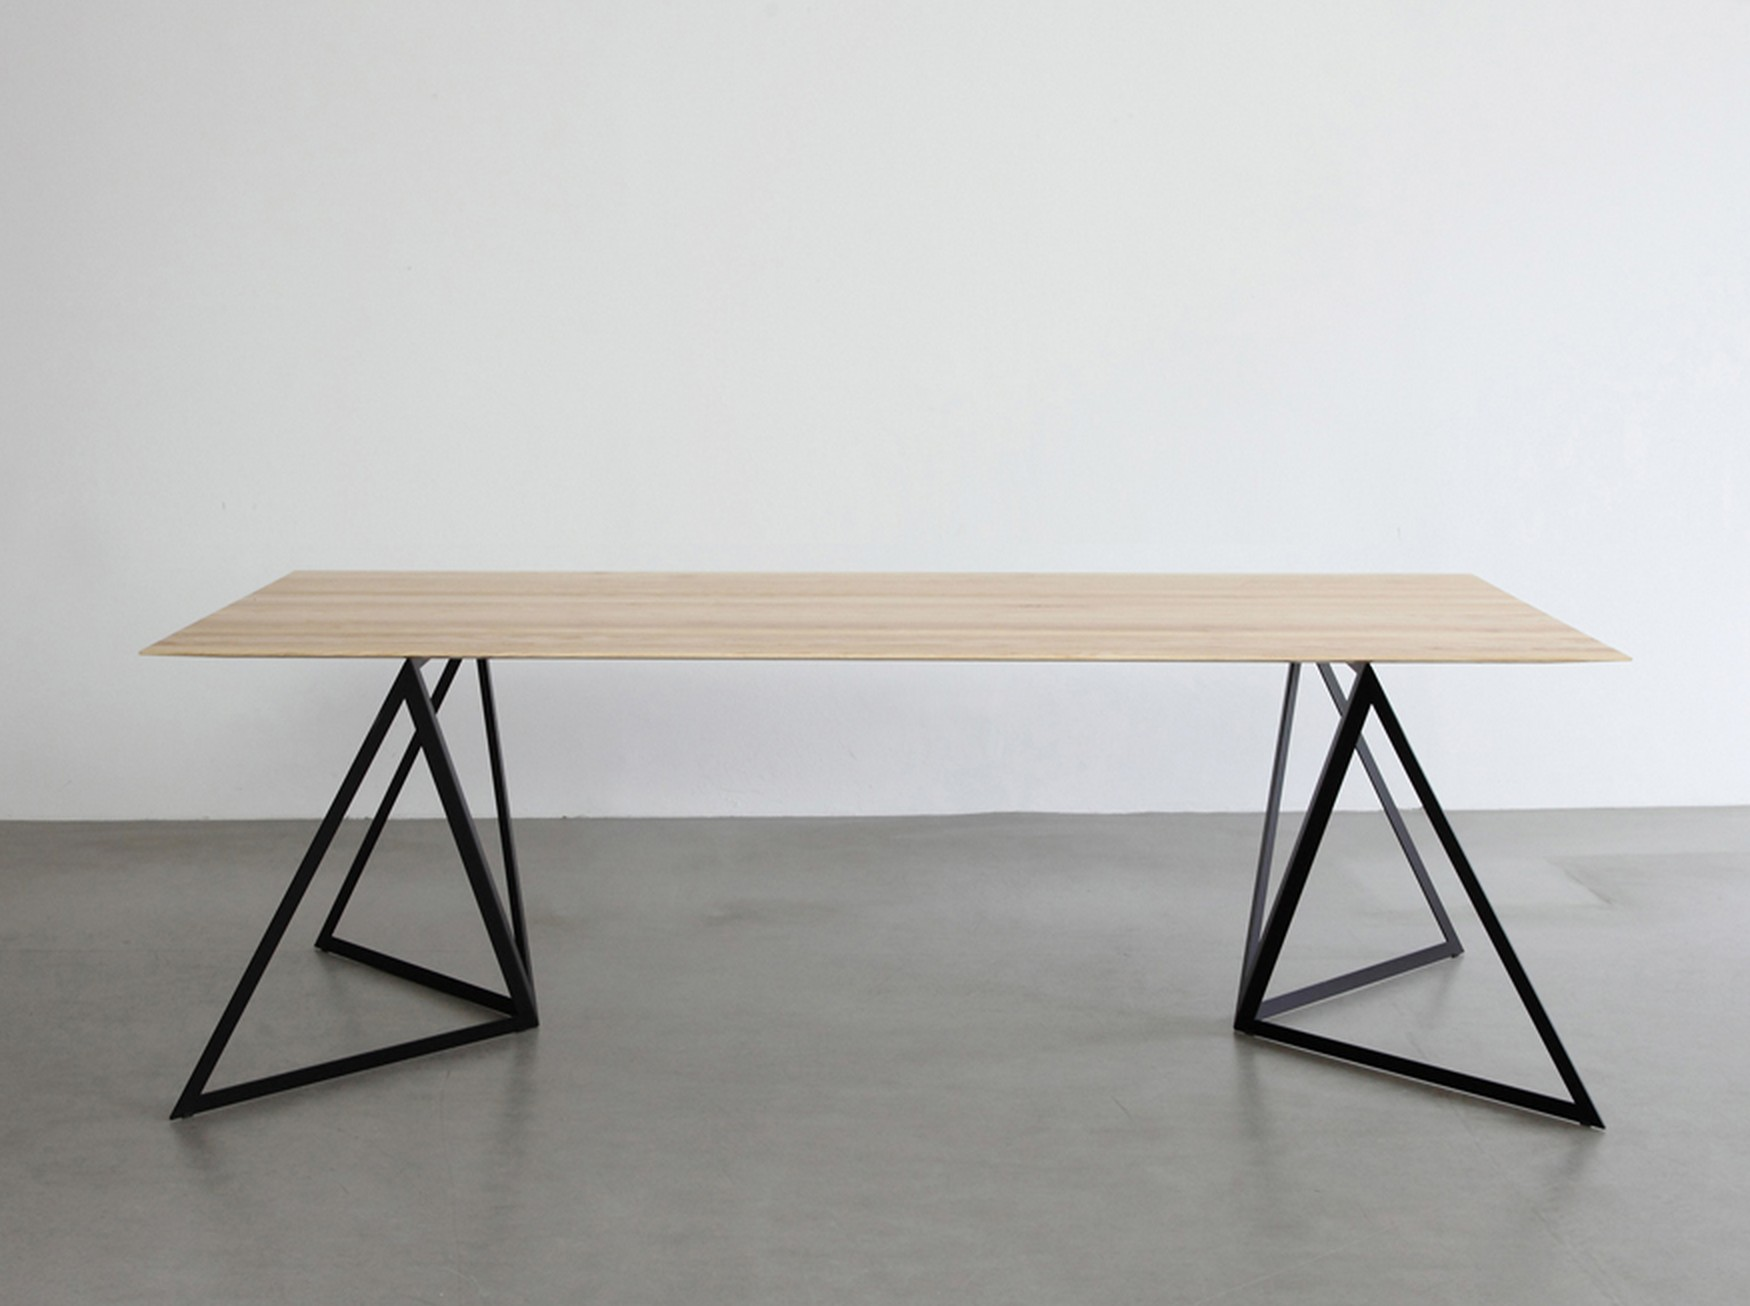 Pieds de table steel stand par sebastian scherer blog - Pied de table metal design ...